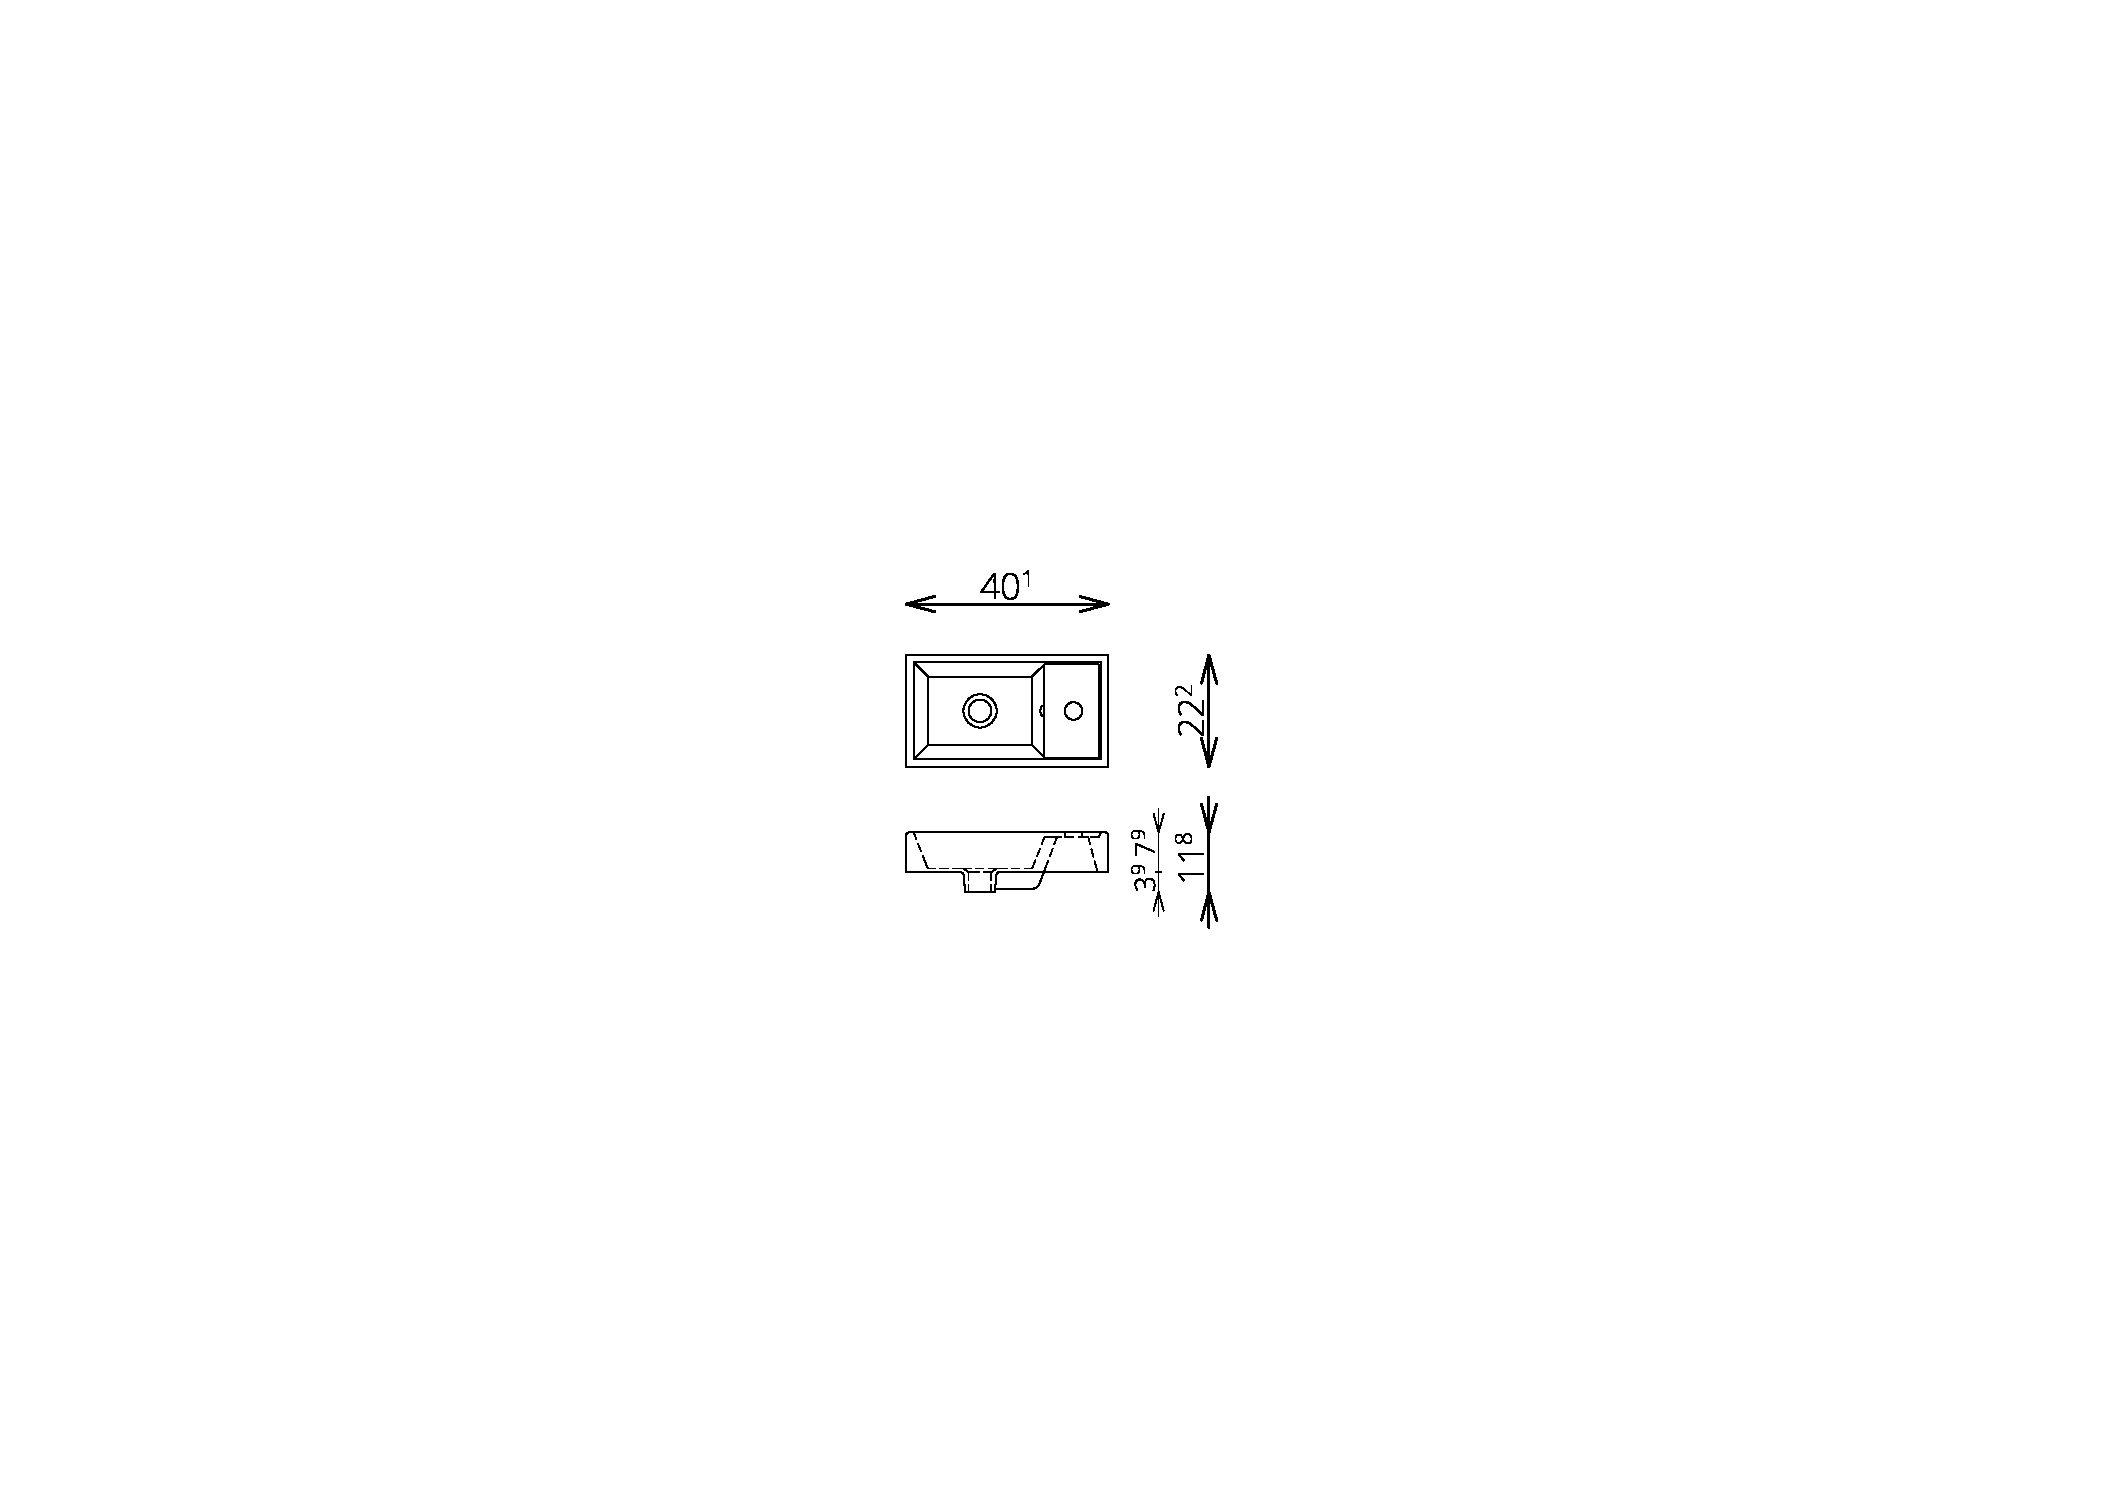 TBOSS-SPARTA-40-MOSDO